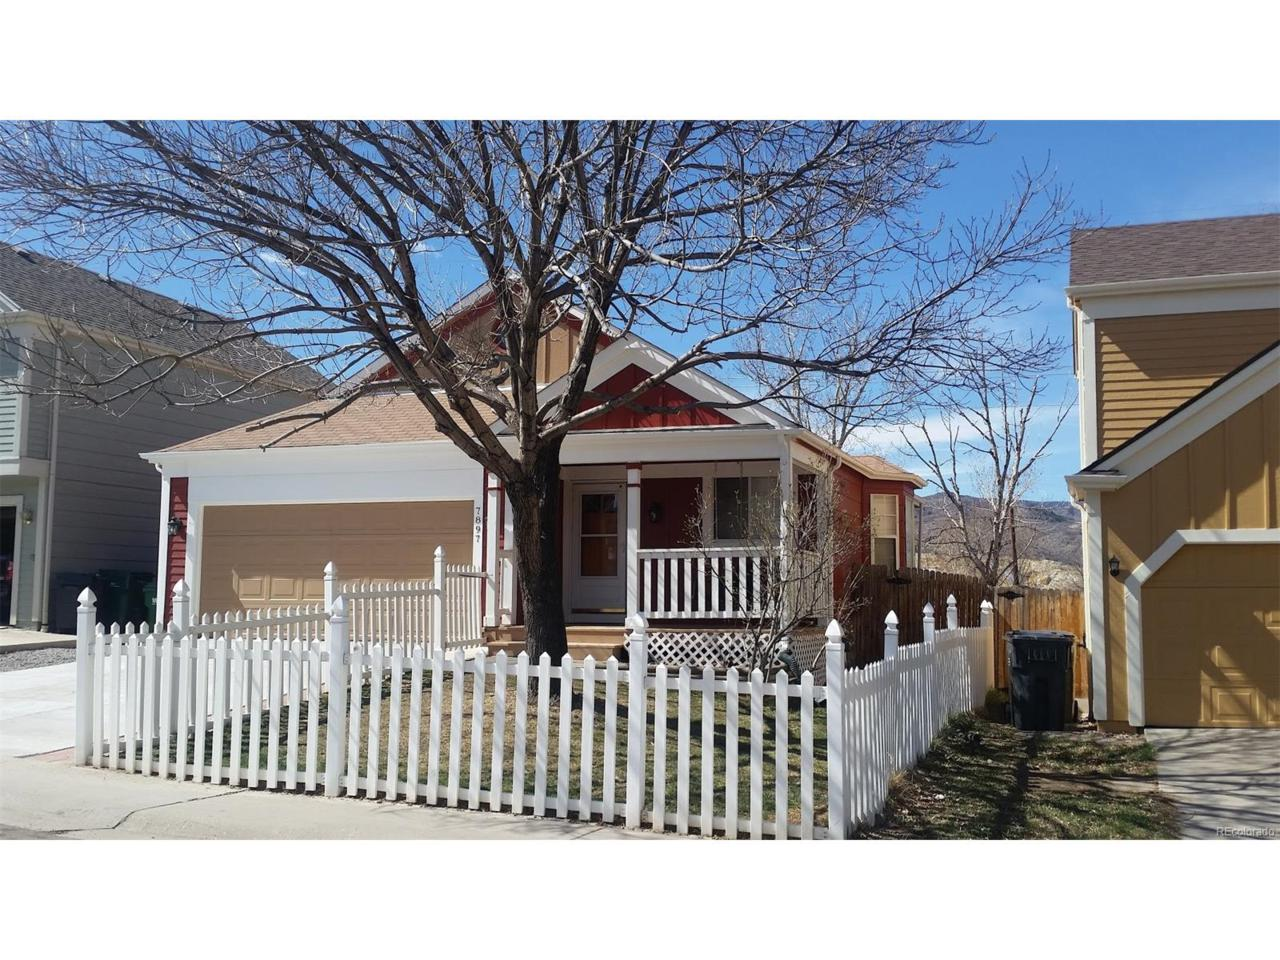 7897 Elmwood Street, Littleton, CO 80125 (MLS #7387588) :: 8z Real Estate